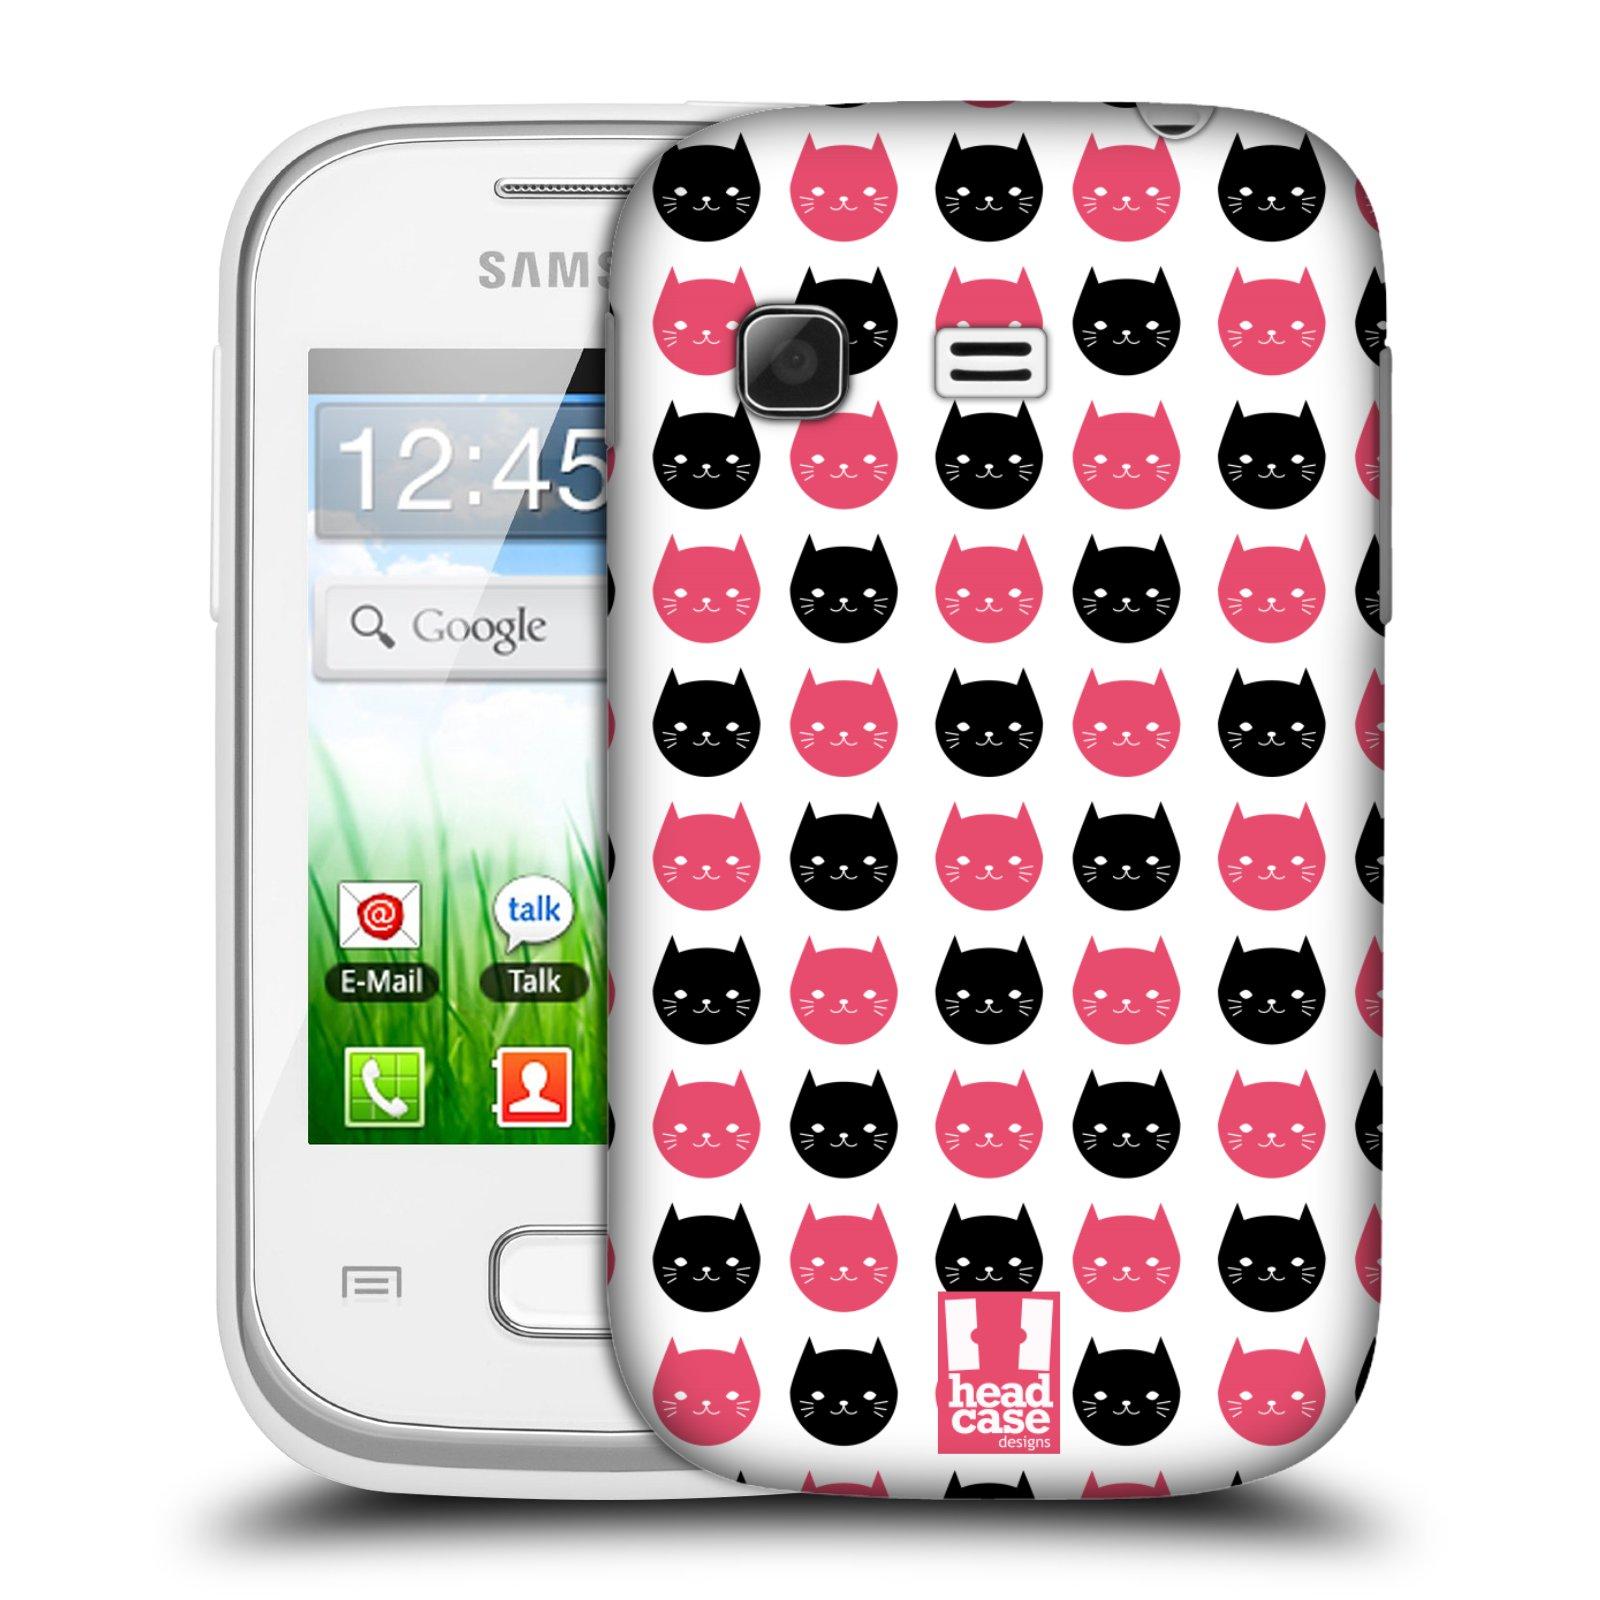 Plastové pouzdro na mobil Samsung Galaxy Pocket HEAD CASE KOČKY Black and Pink (Kryt či obal na mobilní telefon Samsung Galaxy Pocket GT-S5300)